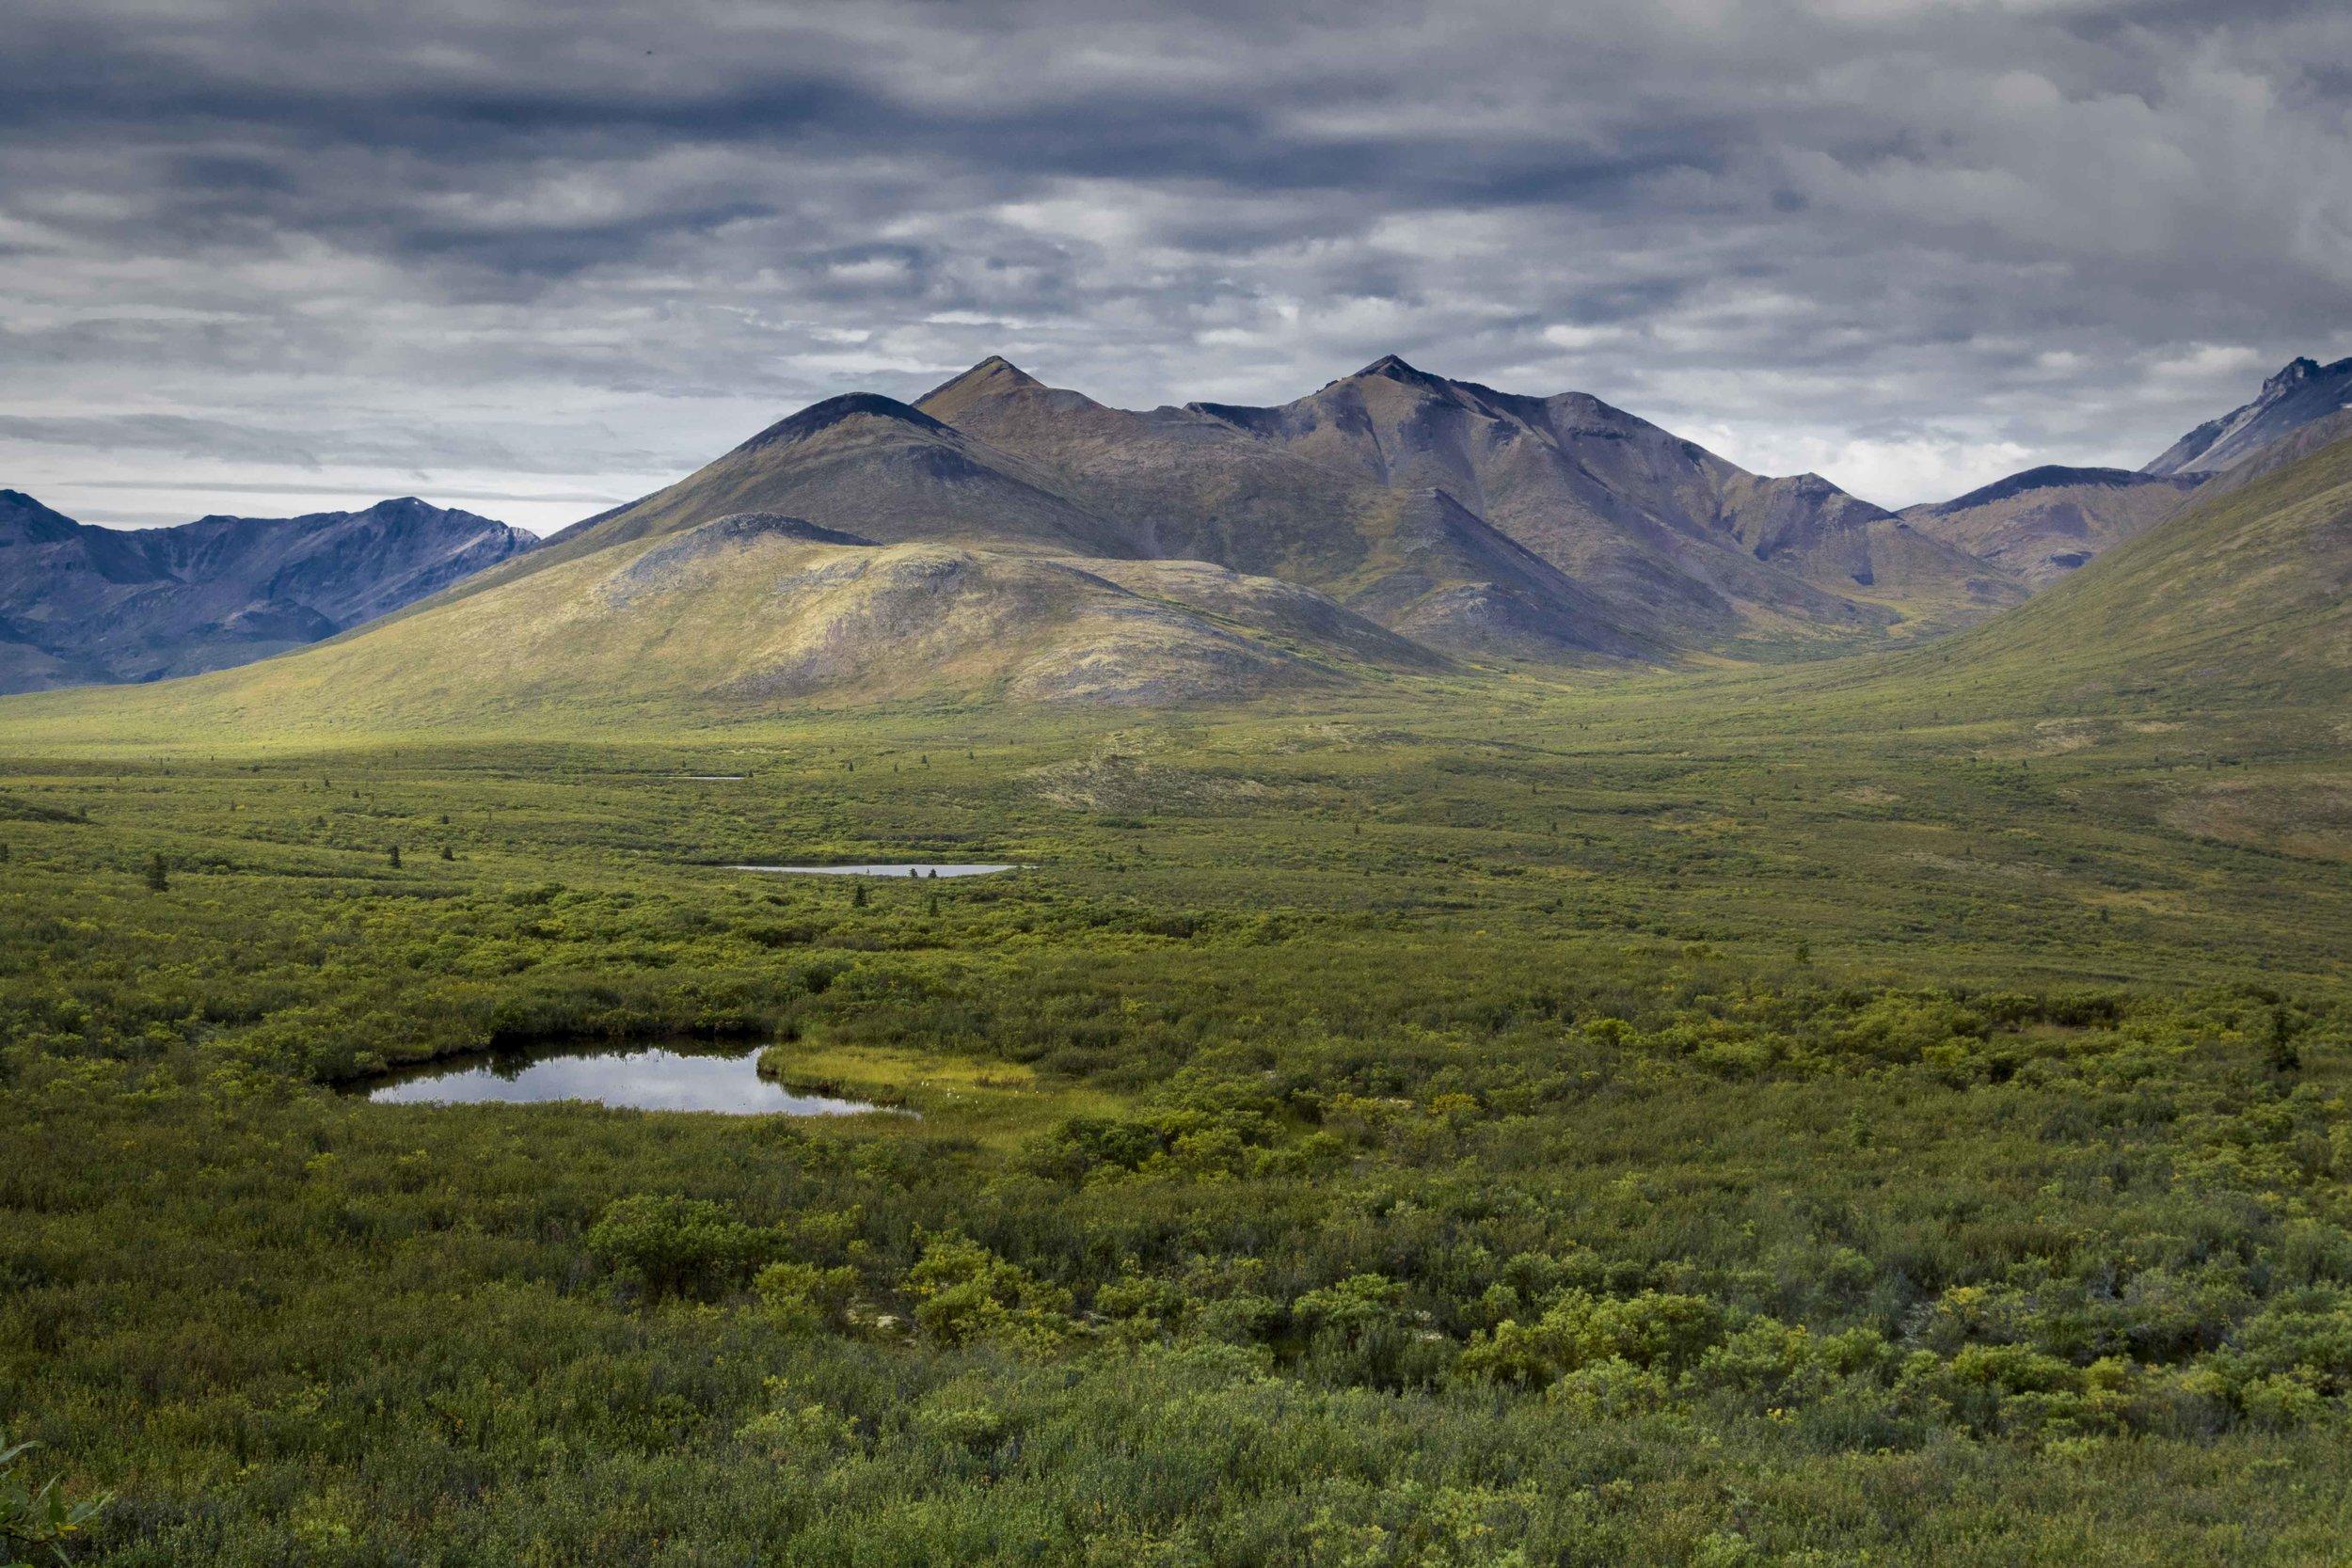 Dempster Highway, Roadtrip, Landscape, Arctic, rob gubiani, Tundra, Tombstone, Tuktoyuktuk, Inuvik, Dempster, Yukon, travel, wanderlust, boreal, forest, boreal forest, fall, autumn, lake,